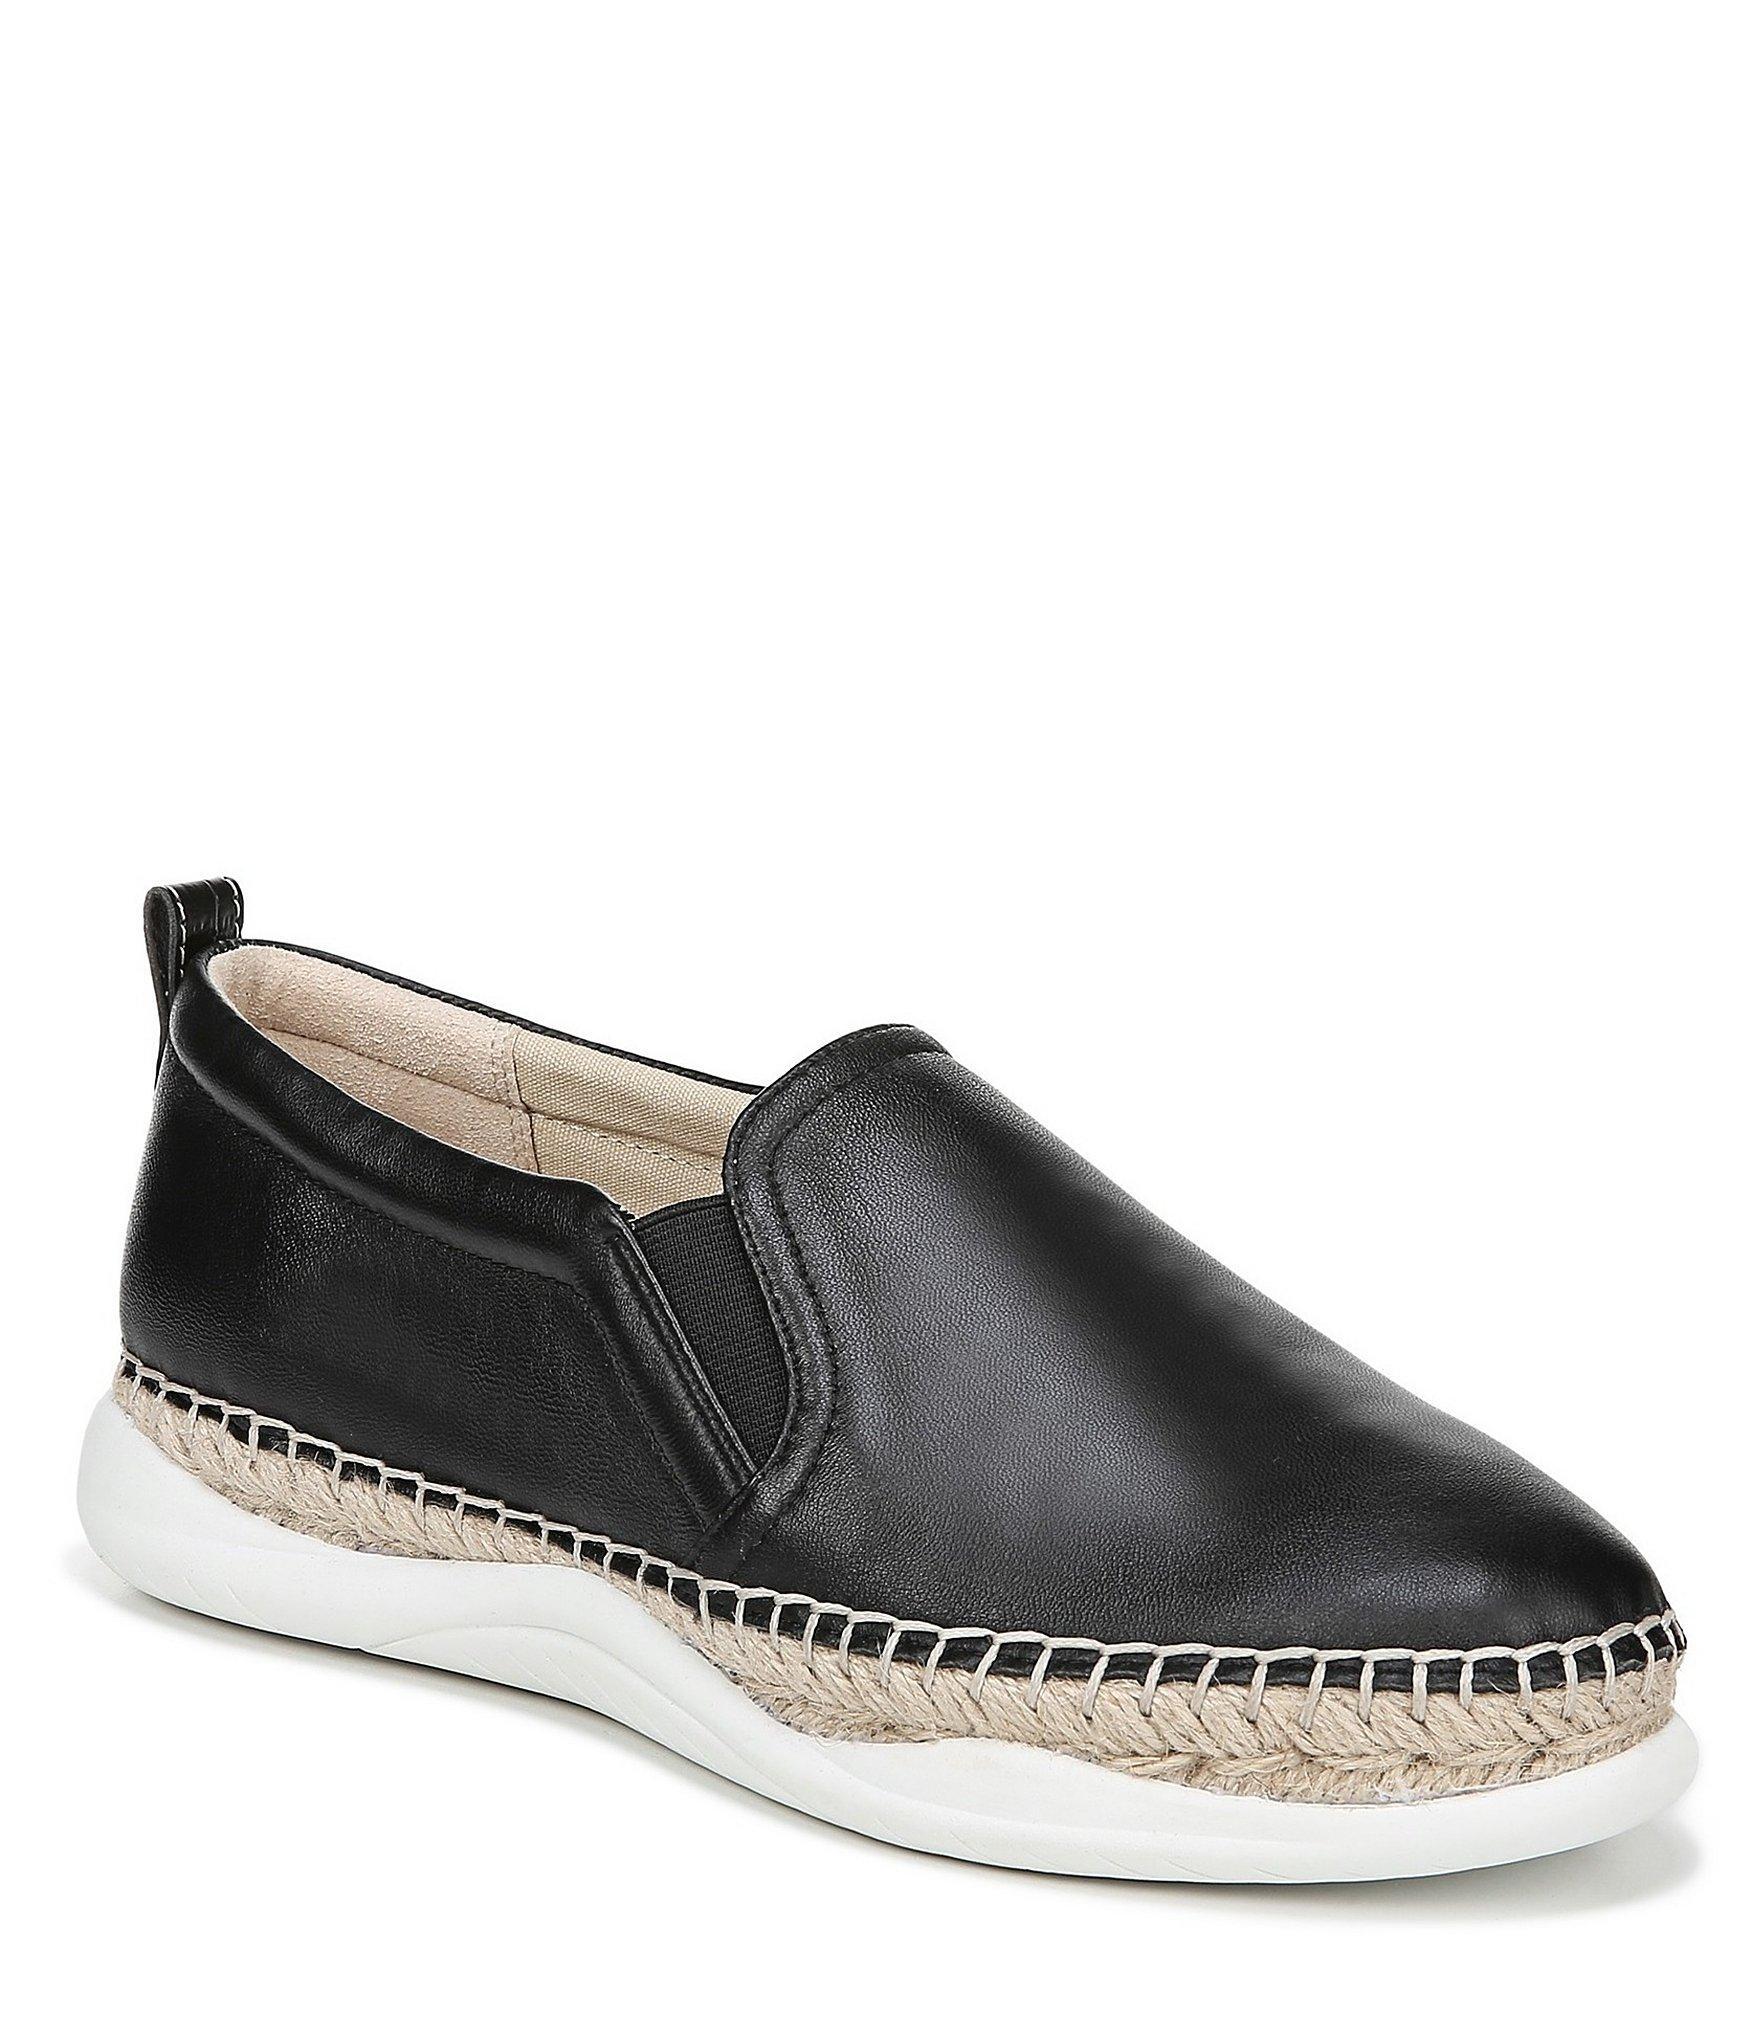 6d6701ad0376 Lyst - Sam Edelman Kassie Leather Espadrilles in Black